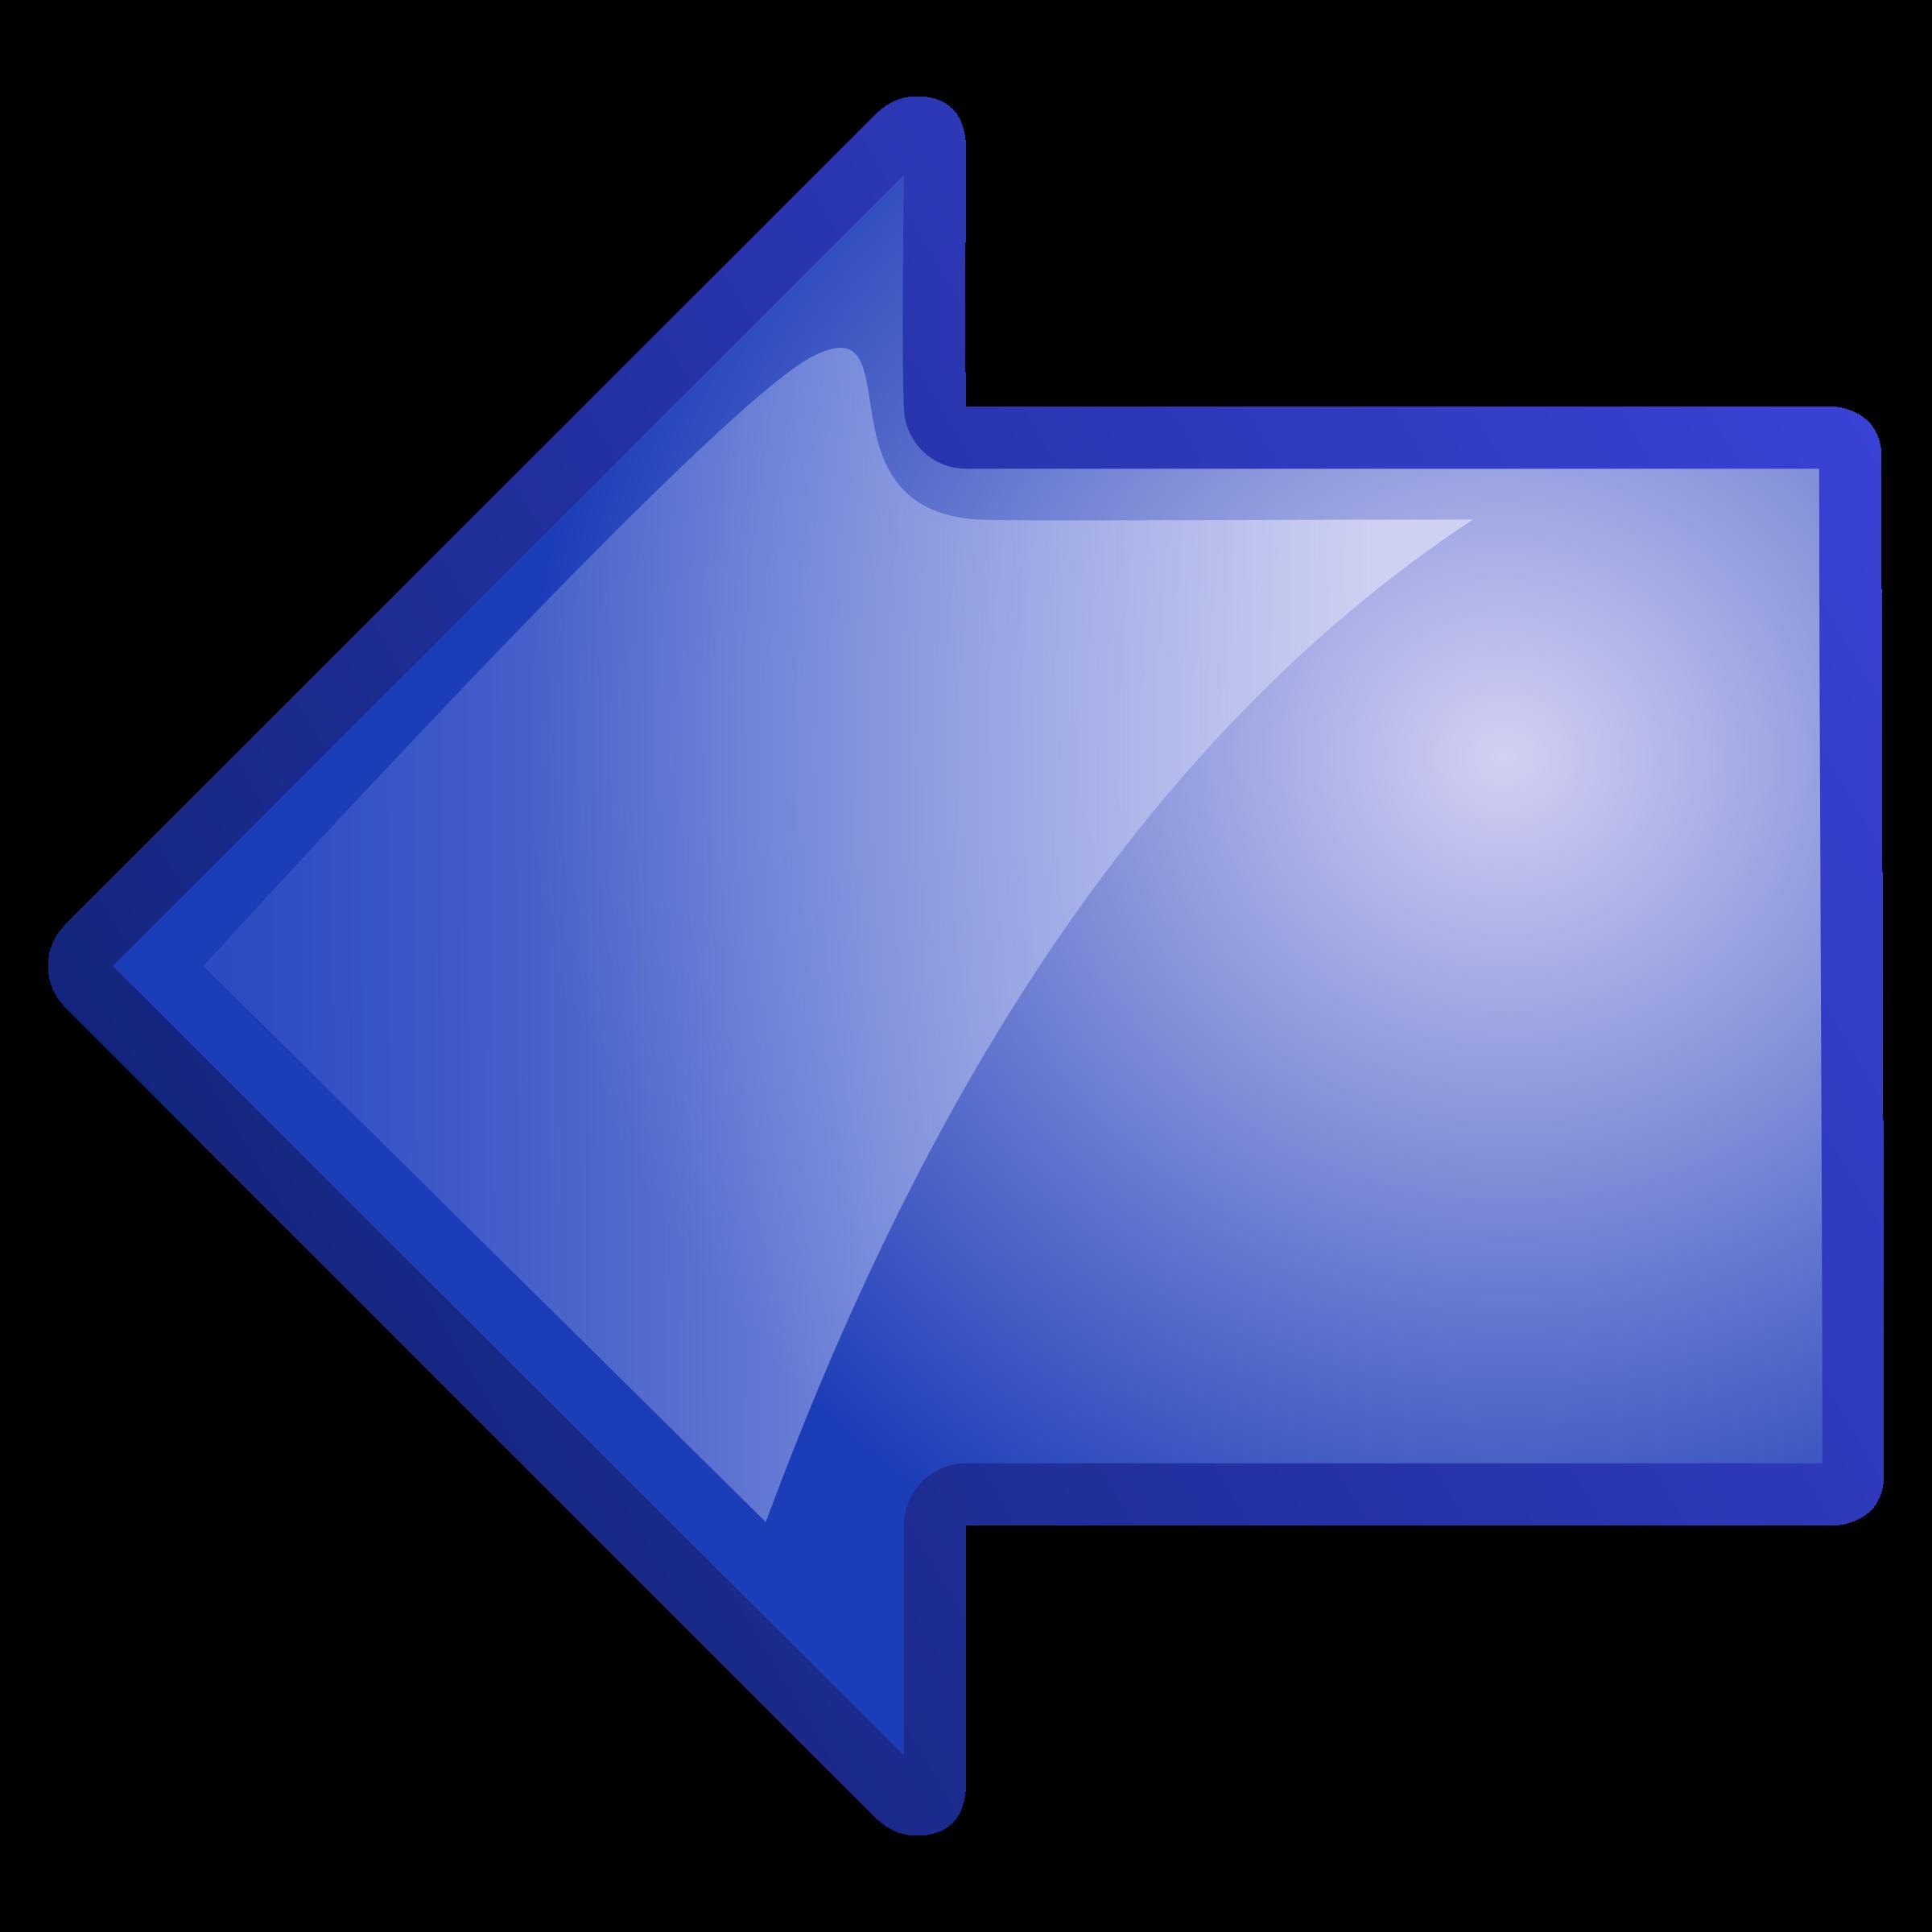 Clip art left arrow jpg royalty free download Clipart - arrow-blue-left jpg royalty free download